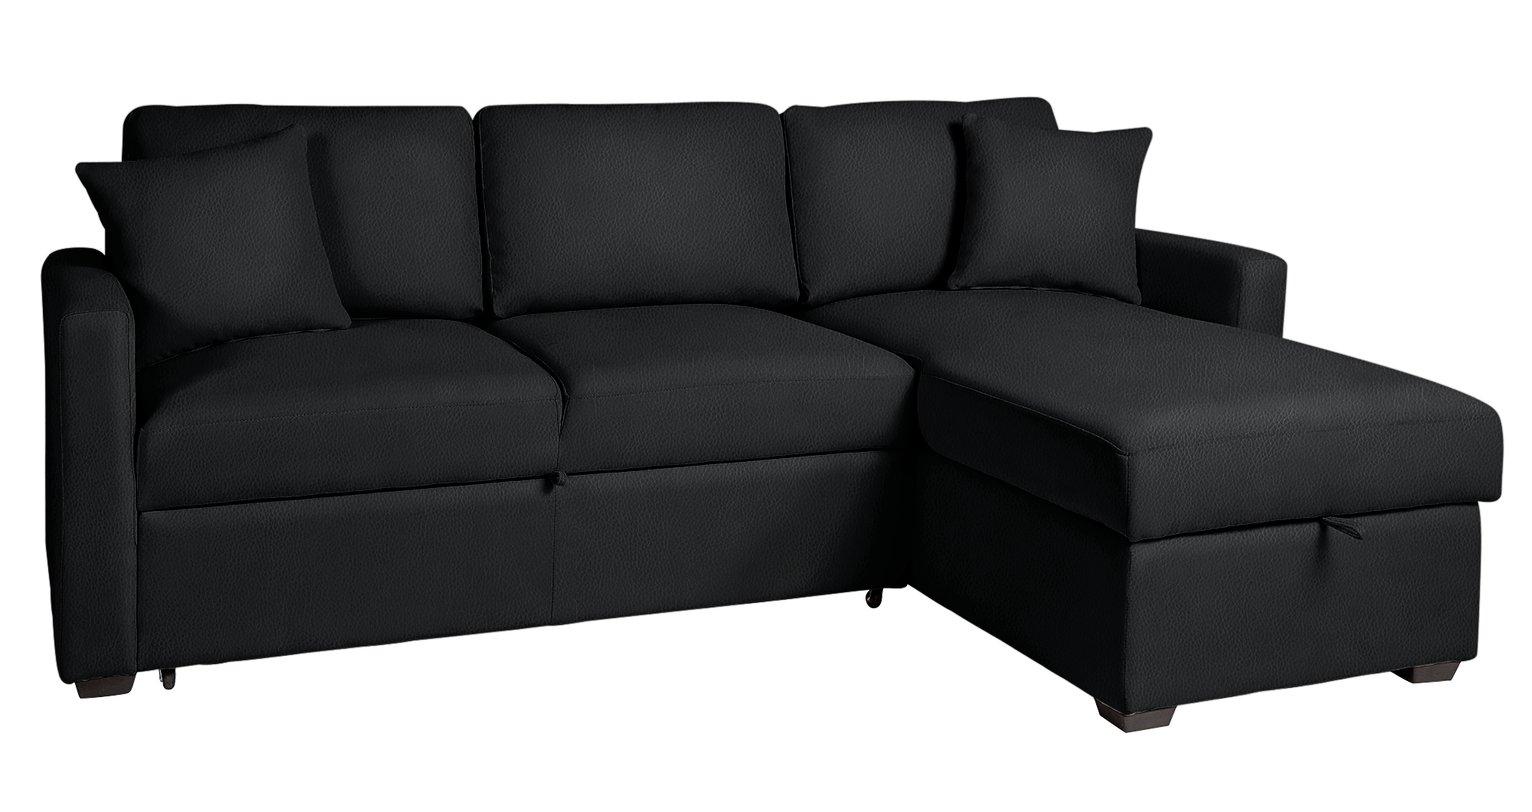 Habitat Reagan Right Corner Faux Leather Sofa Bed - Black